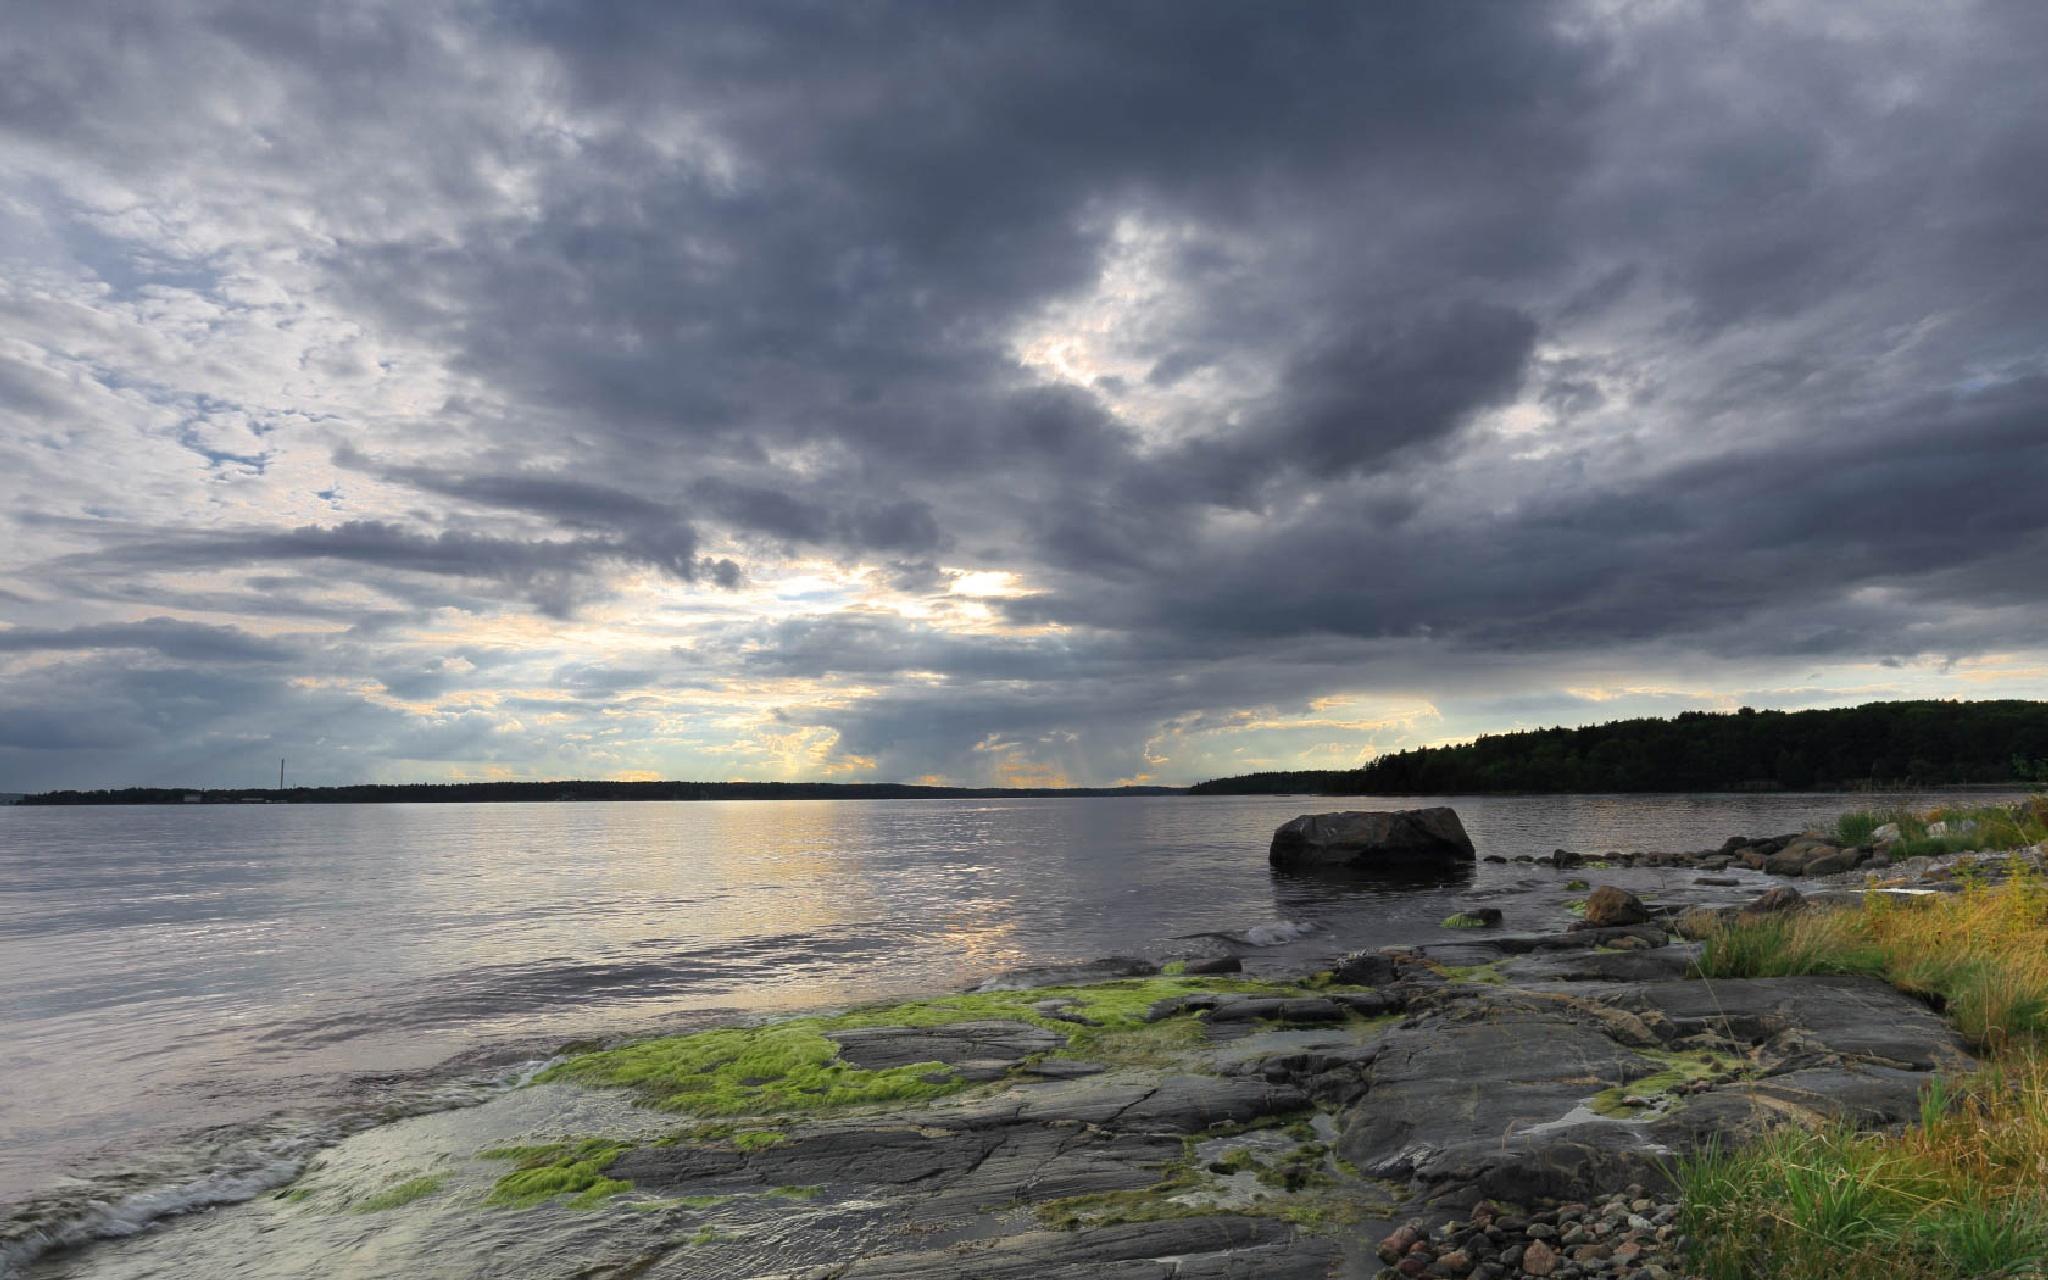 Karlsudd, Stockholm archipelago, Sweden by micke.wallman